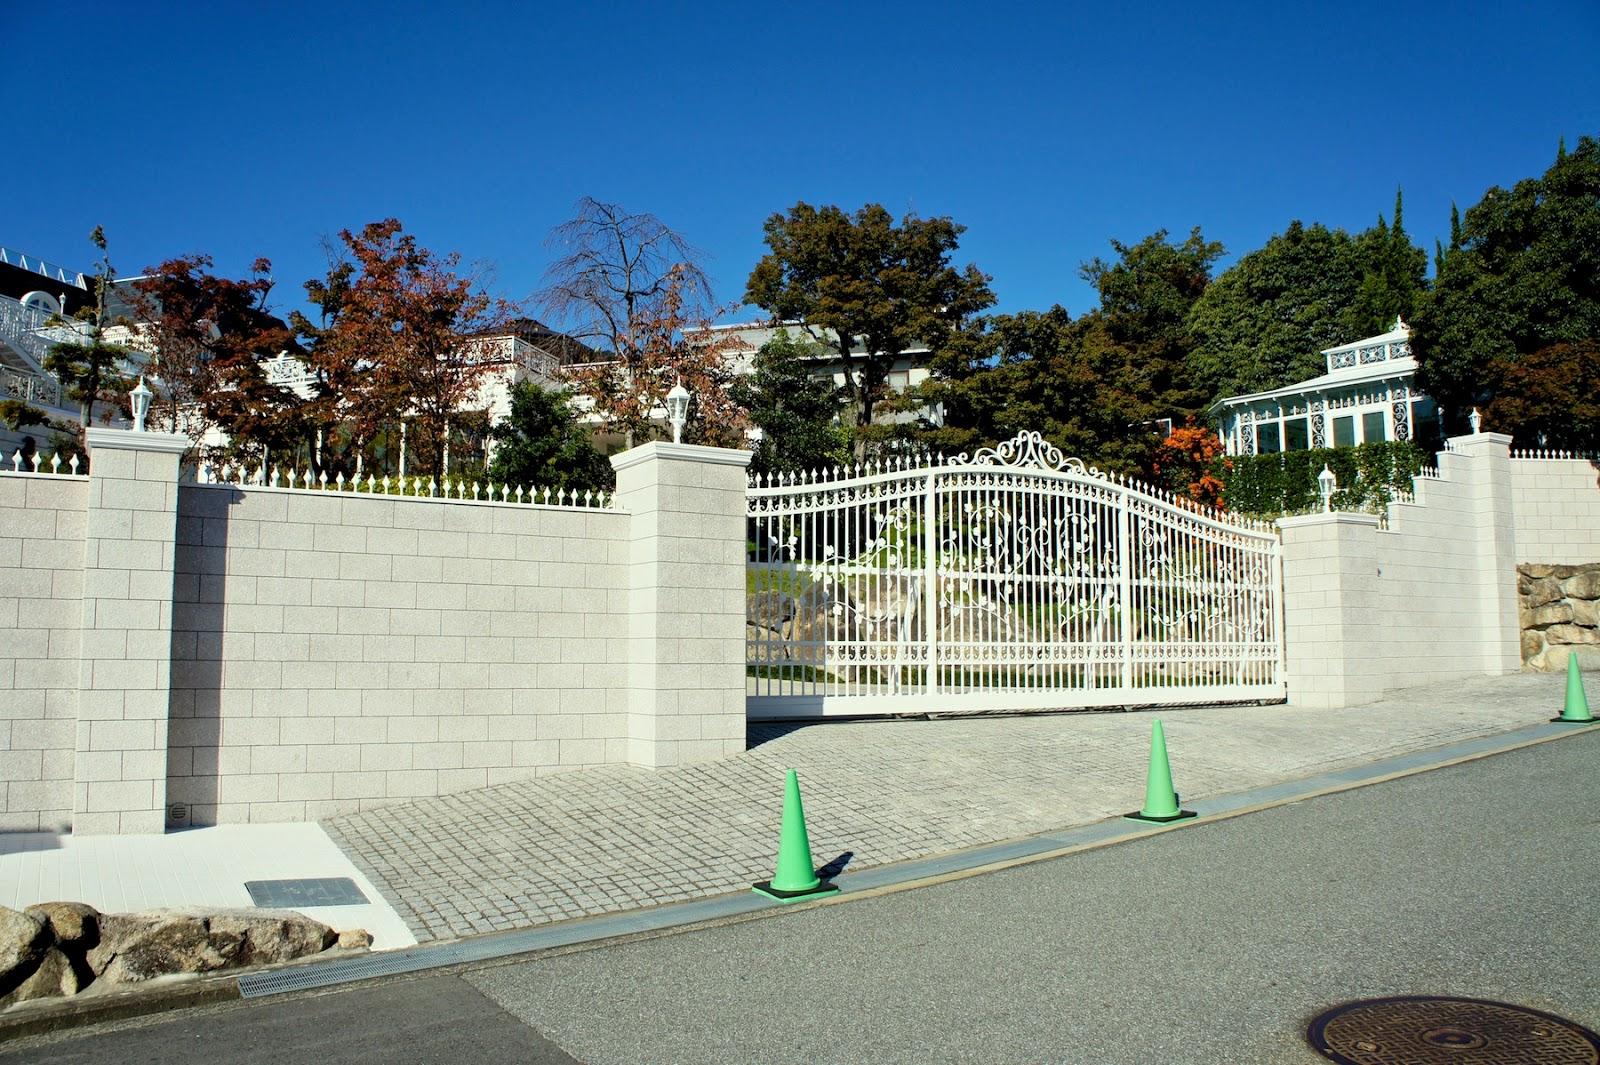 Tokiwai's Photo Blog: 芦屋の邸宅 六麓荘の秋